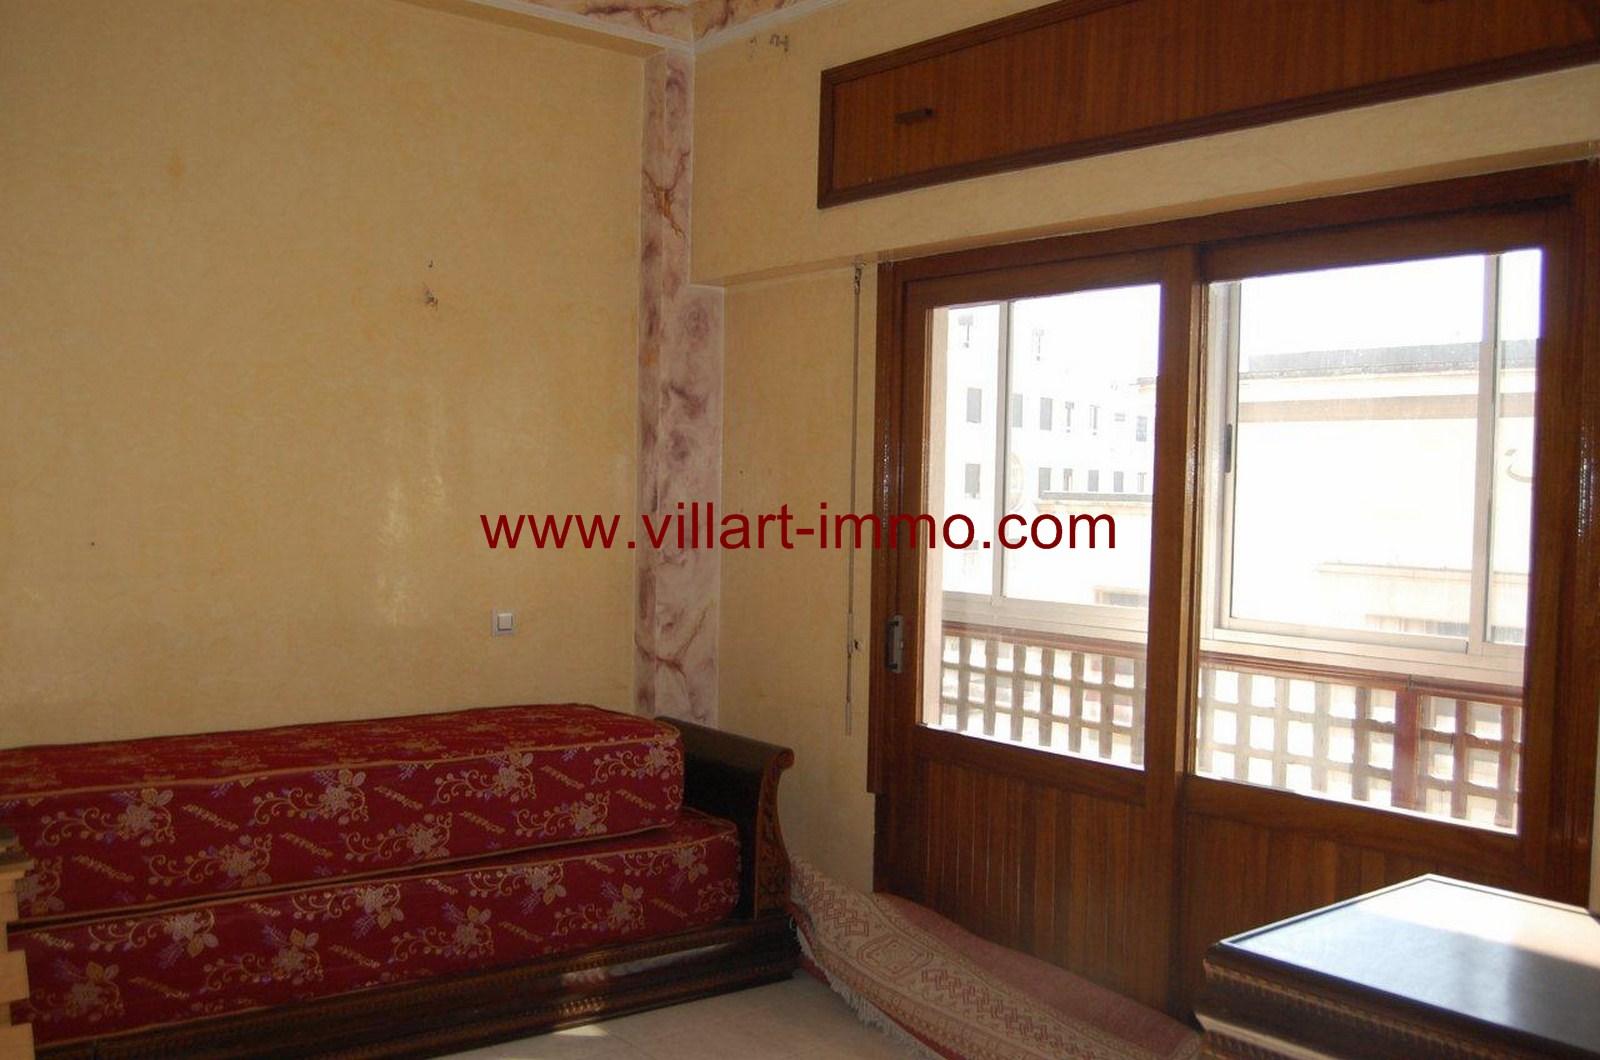 2-vente-appartement-Tanger-centre ville-salon 2-VA365-Villart Immo